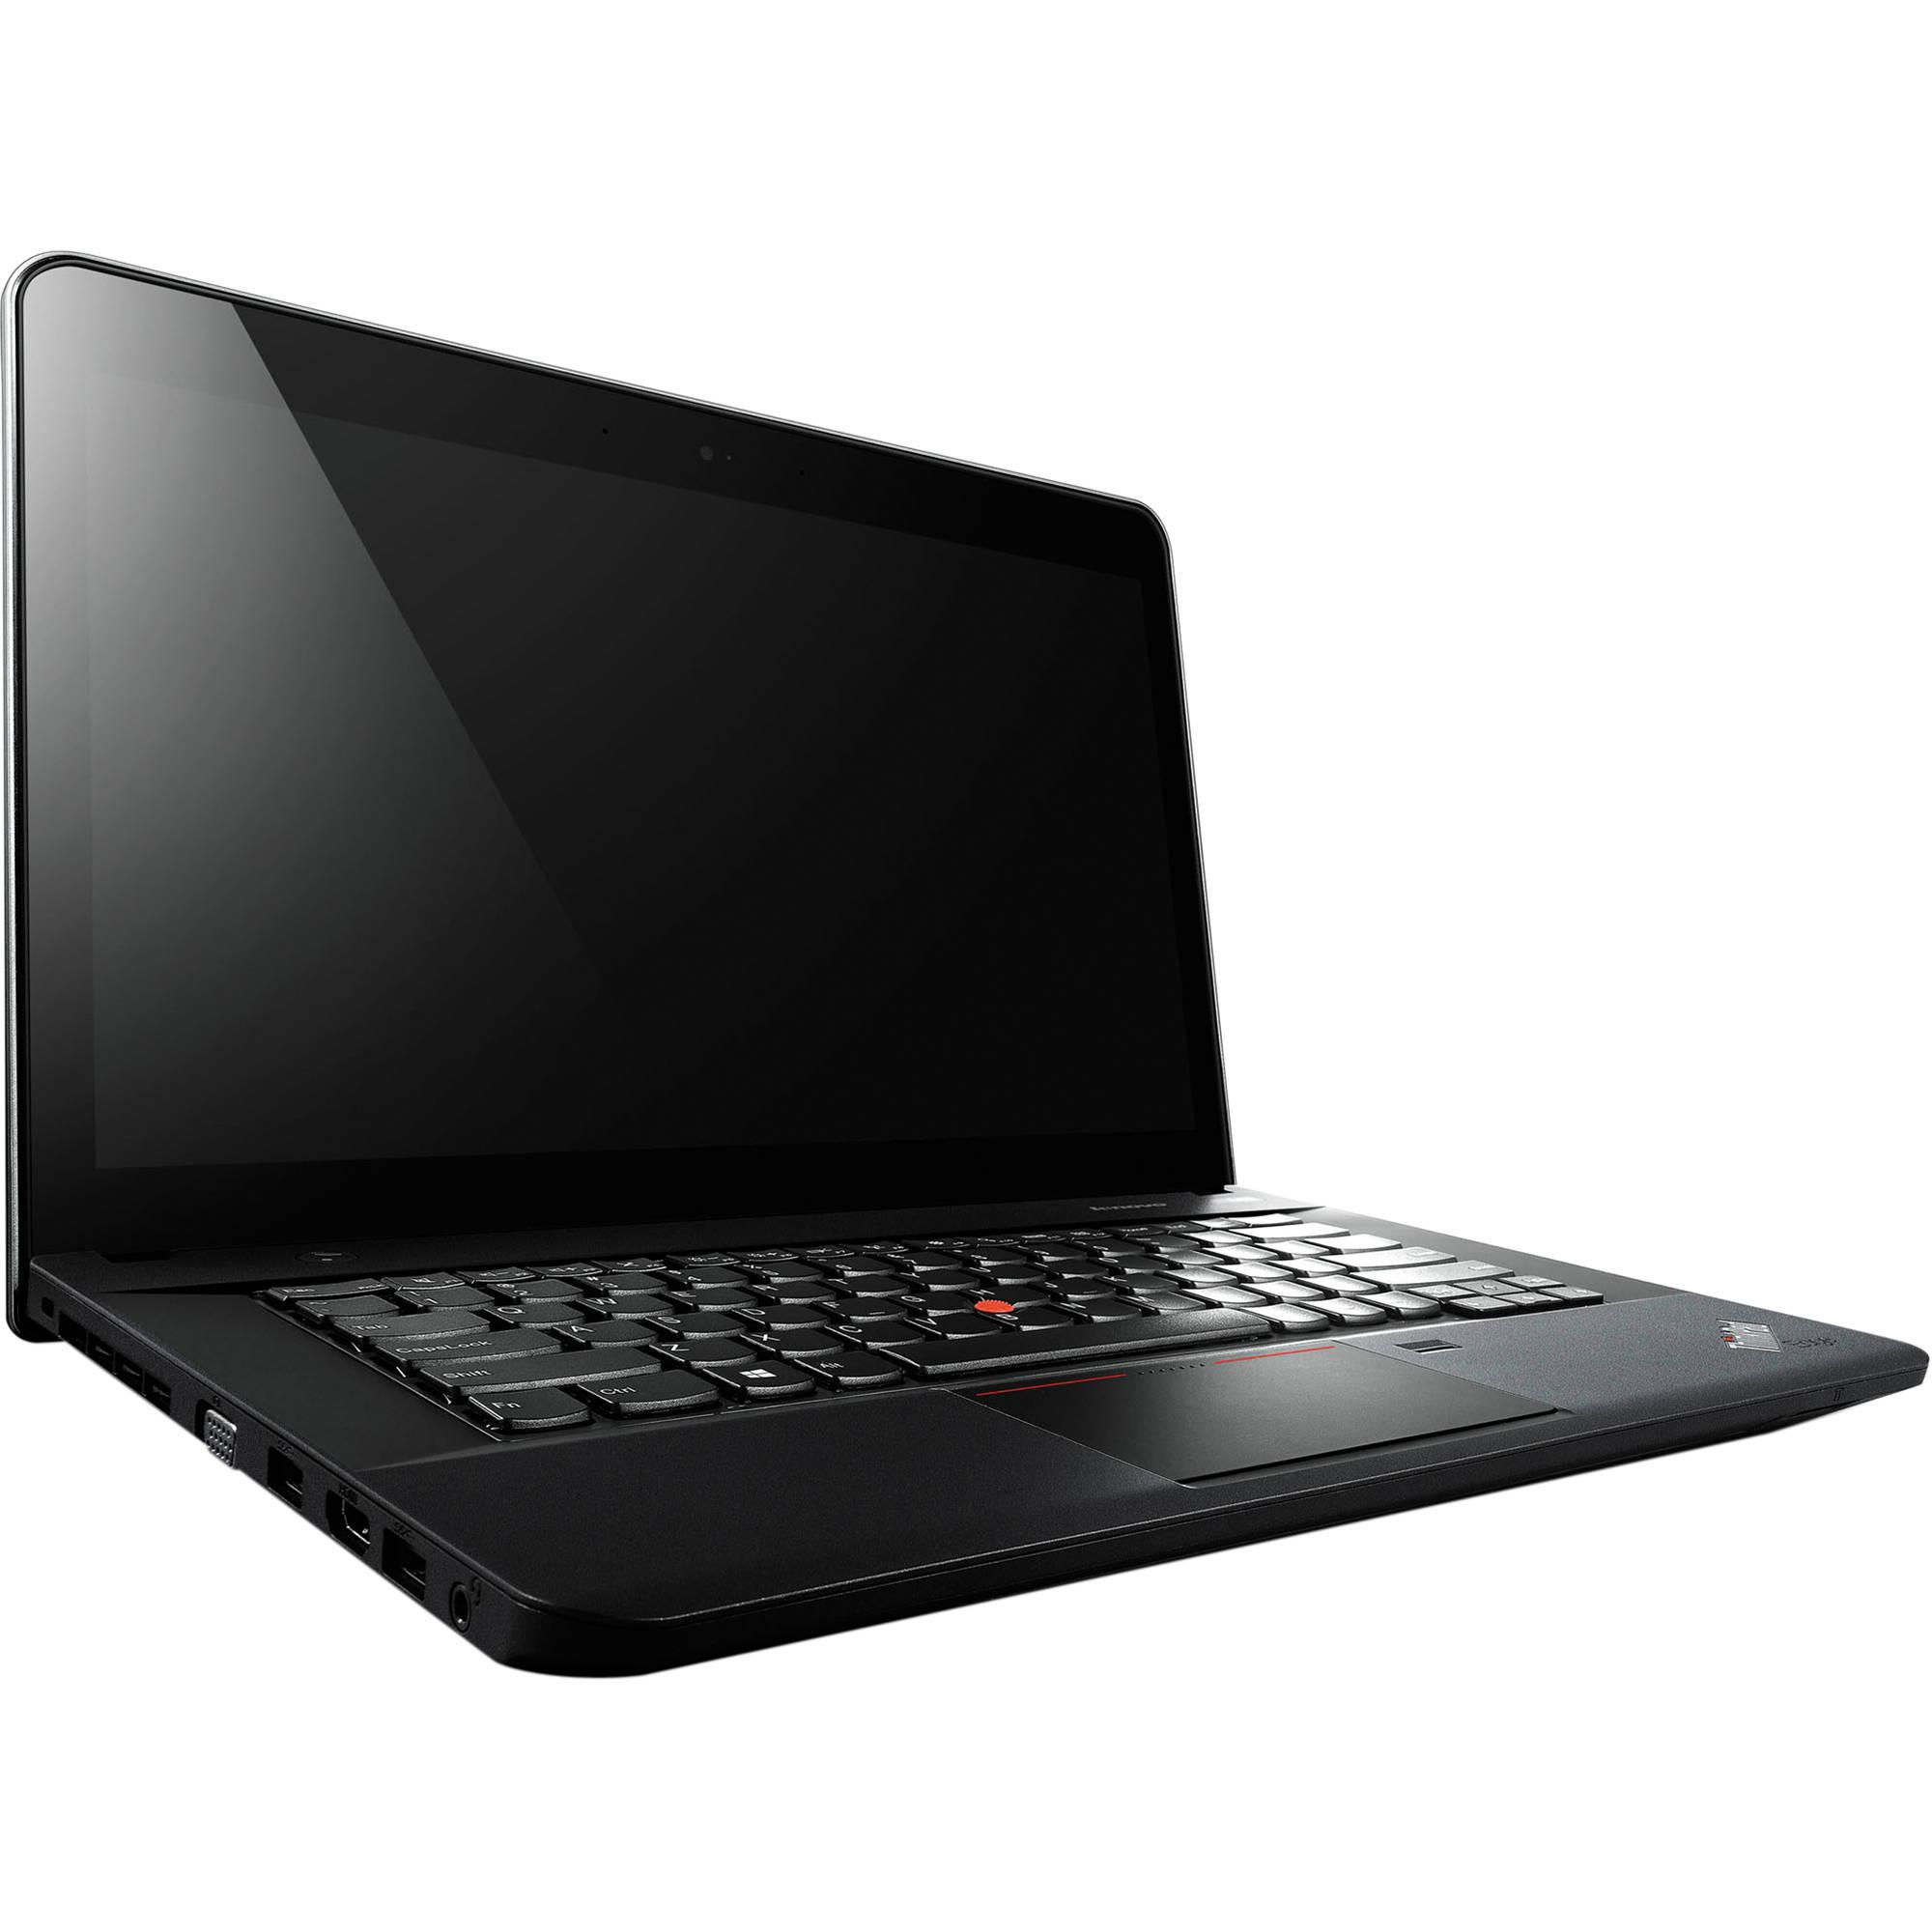 Lenovo ThinkPad Edge E440 Integrated Camera Mac